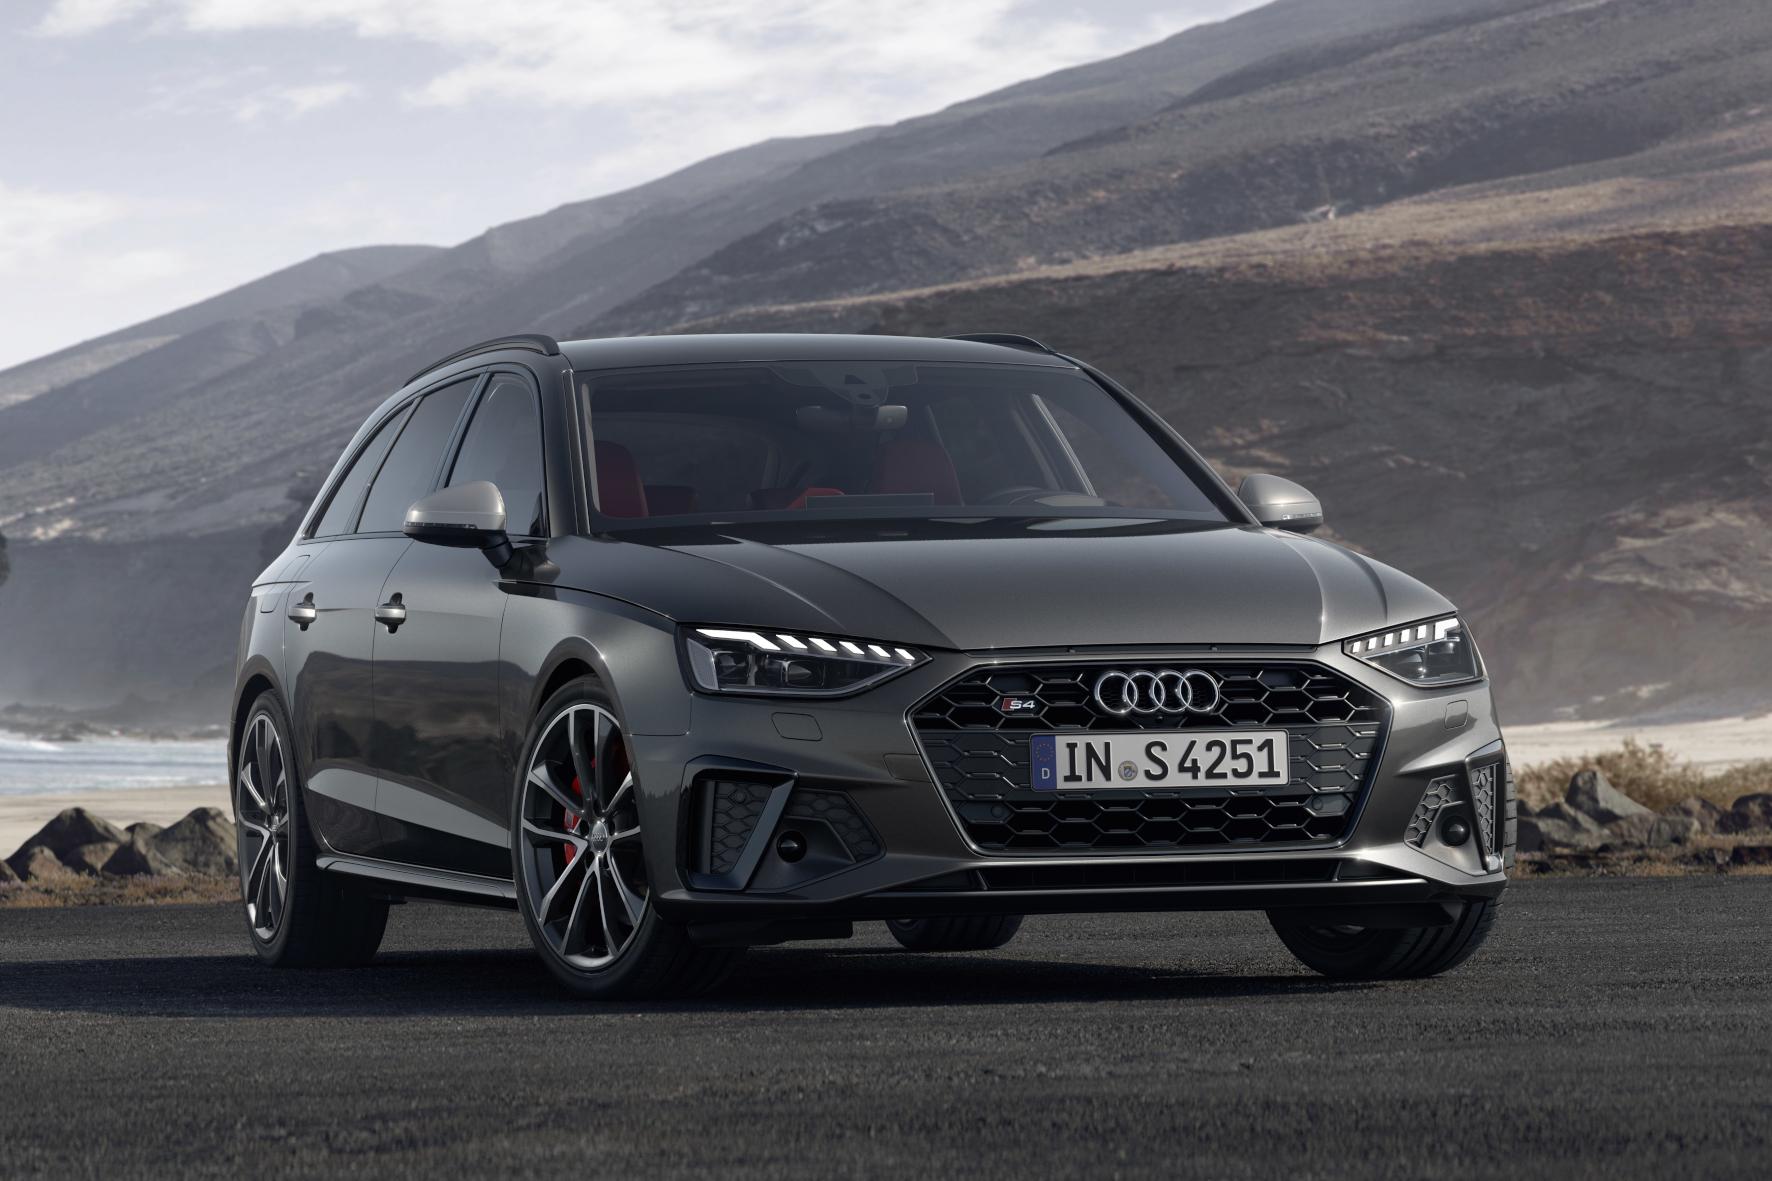 Der Audi S4 Avant liefert muntere 347 PS an alle vier Räder.